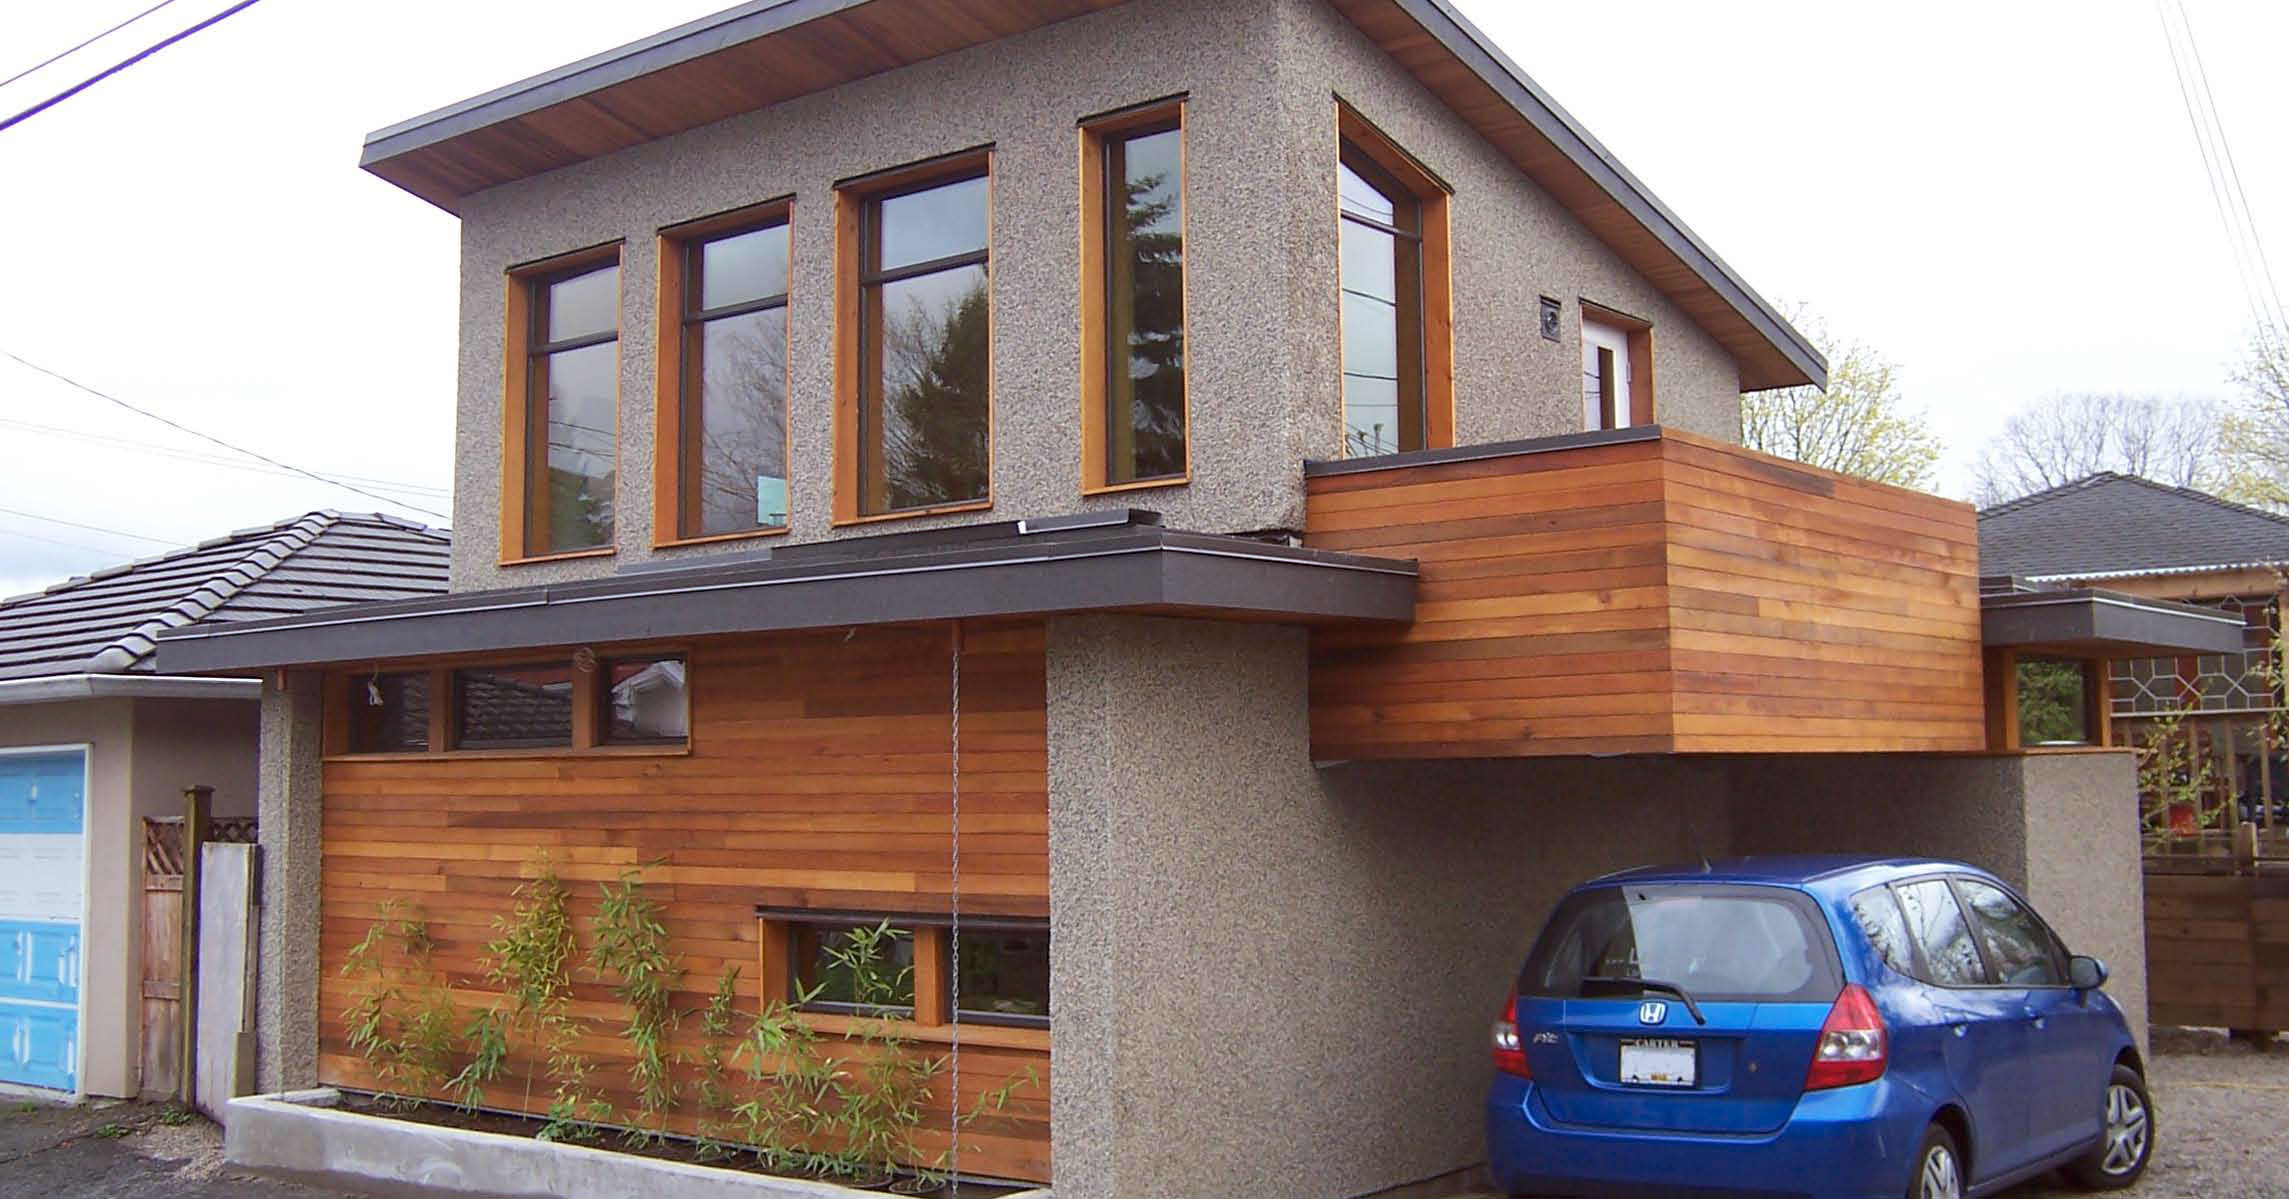 Energy Efficient Laneway Homes Help Green Vancouver S Urban Areas Plasti Fab